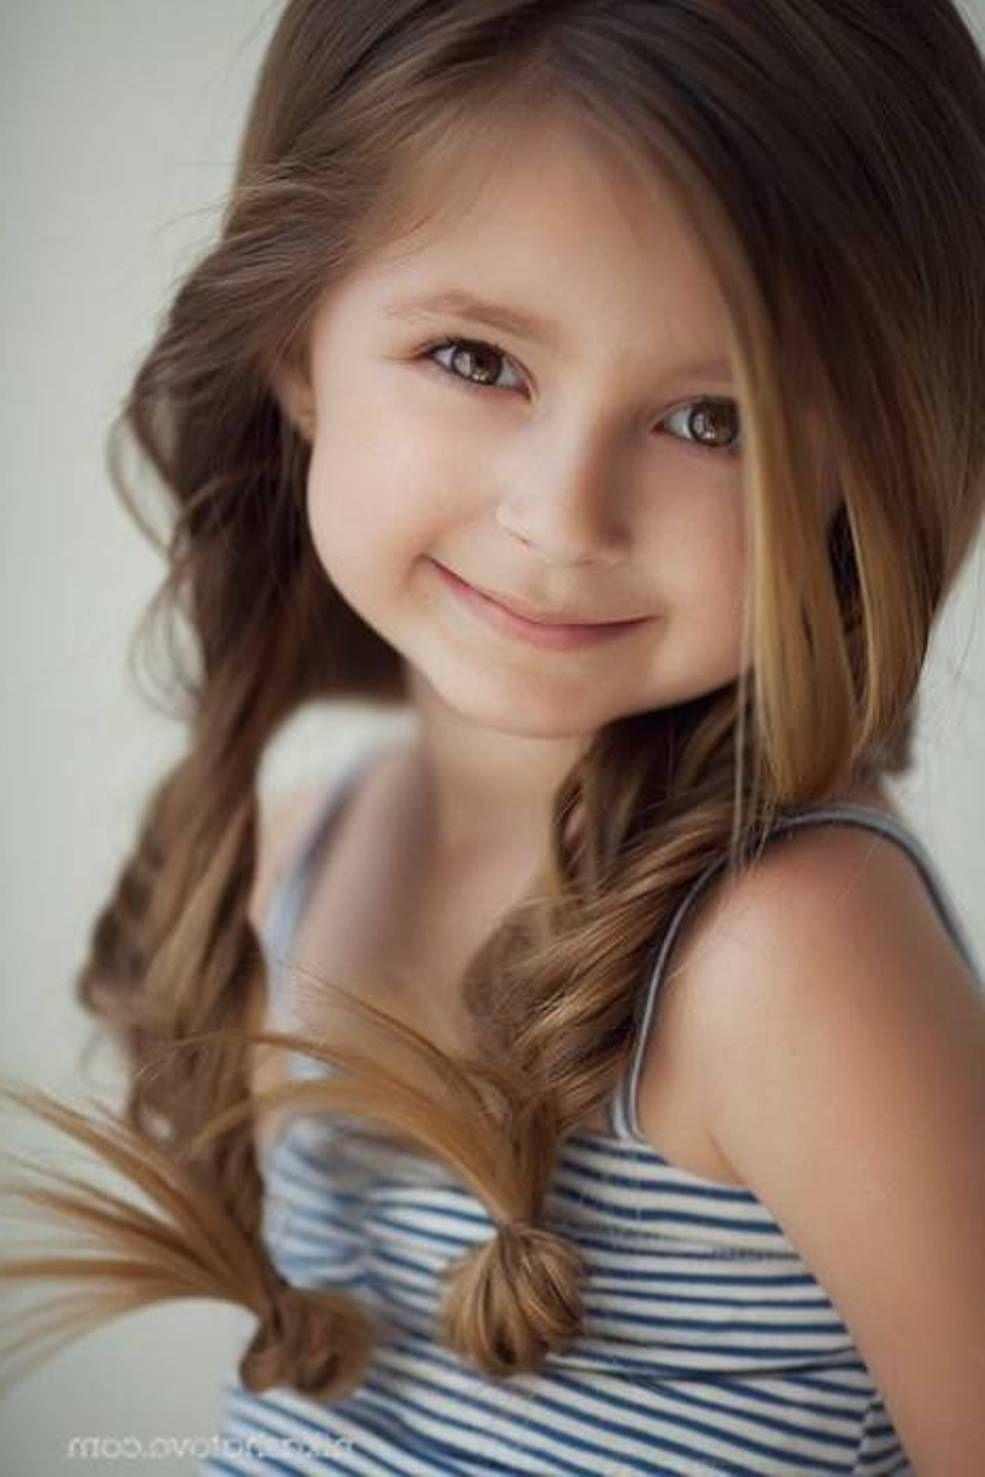 Awe Inspiring Little Girls Cute Hairstyles And Hairstyles On Pinterest Short Hairstyles For Black Women Fulllsitofus